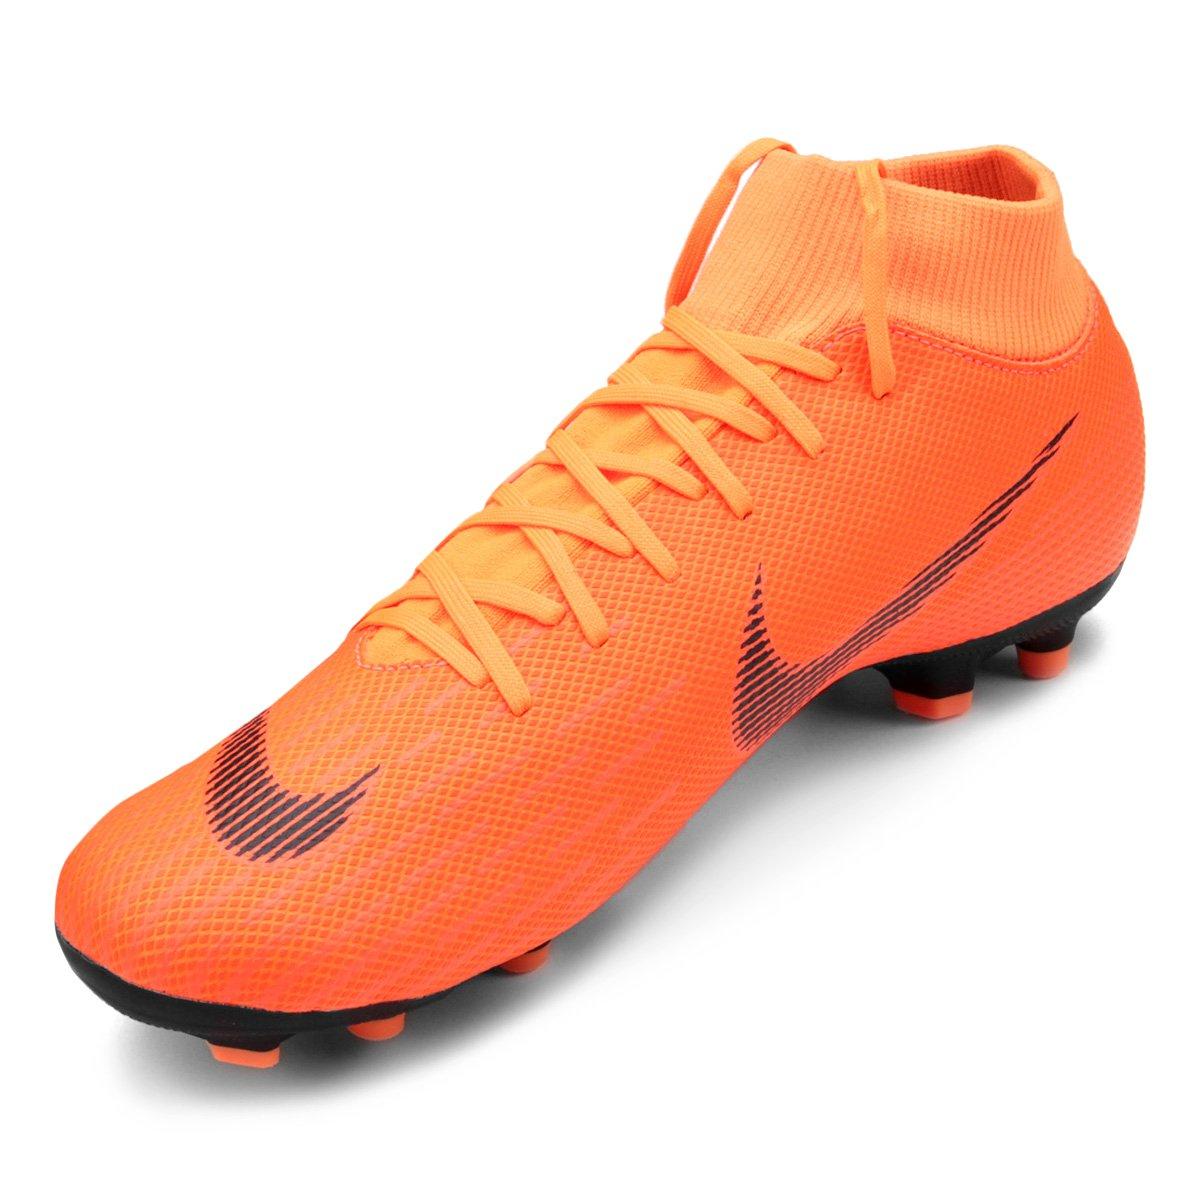 Chuteira Campo Nike Mercurial Superfly 6 Academy - Laranja e Preto ... a0b3dca2ca536